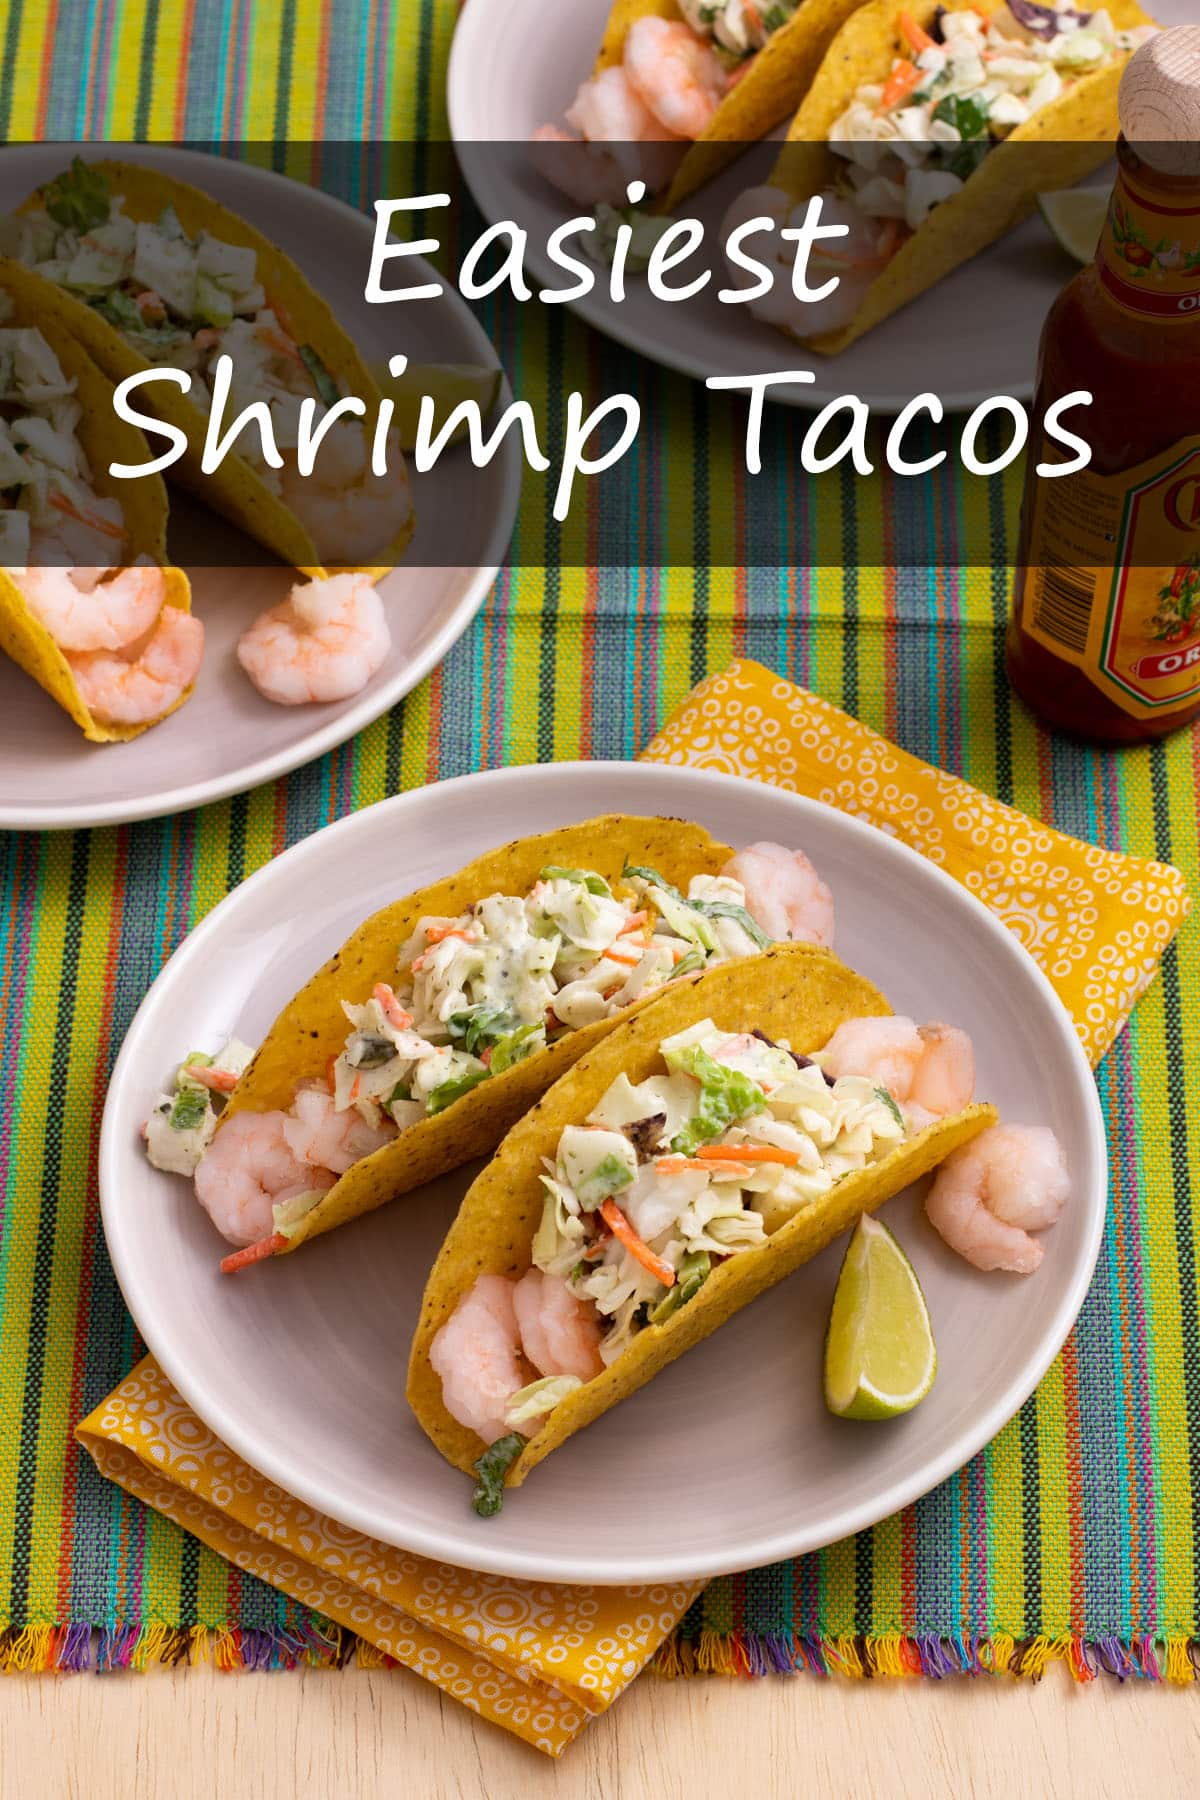 Easiest Shrimp Tacos